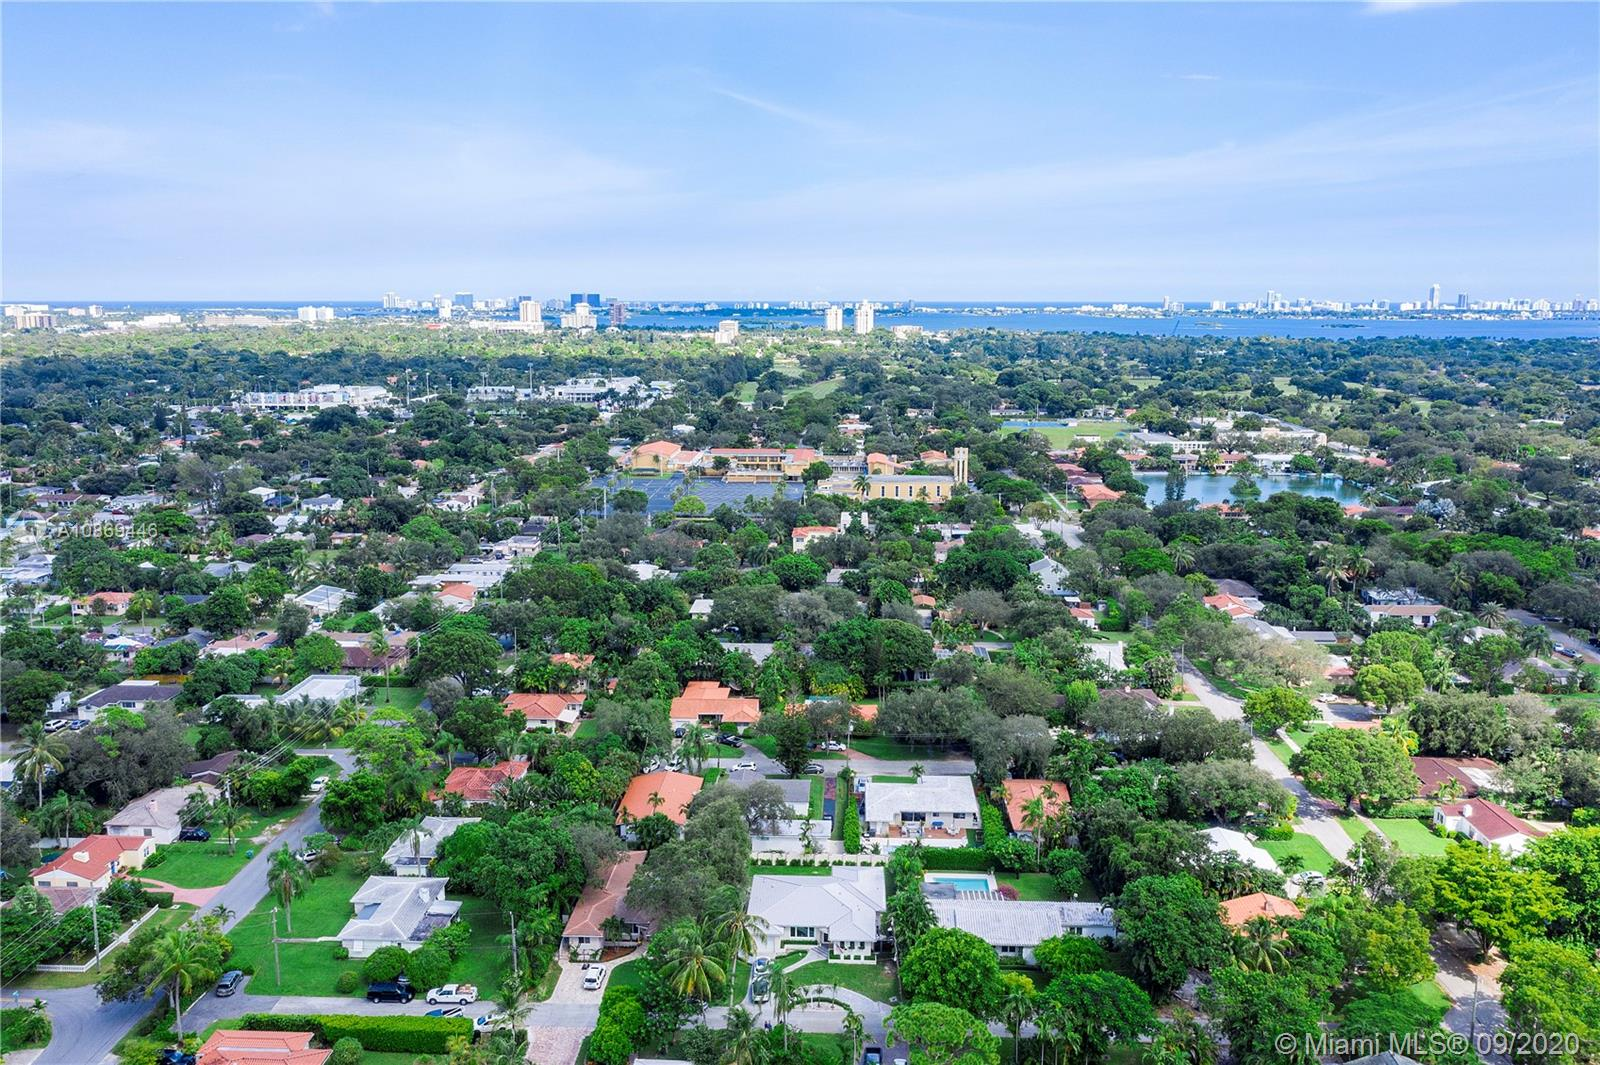 Miami Shores # - 65 - photo